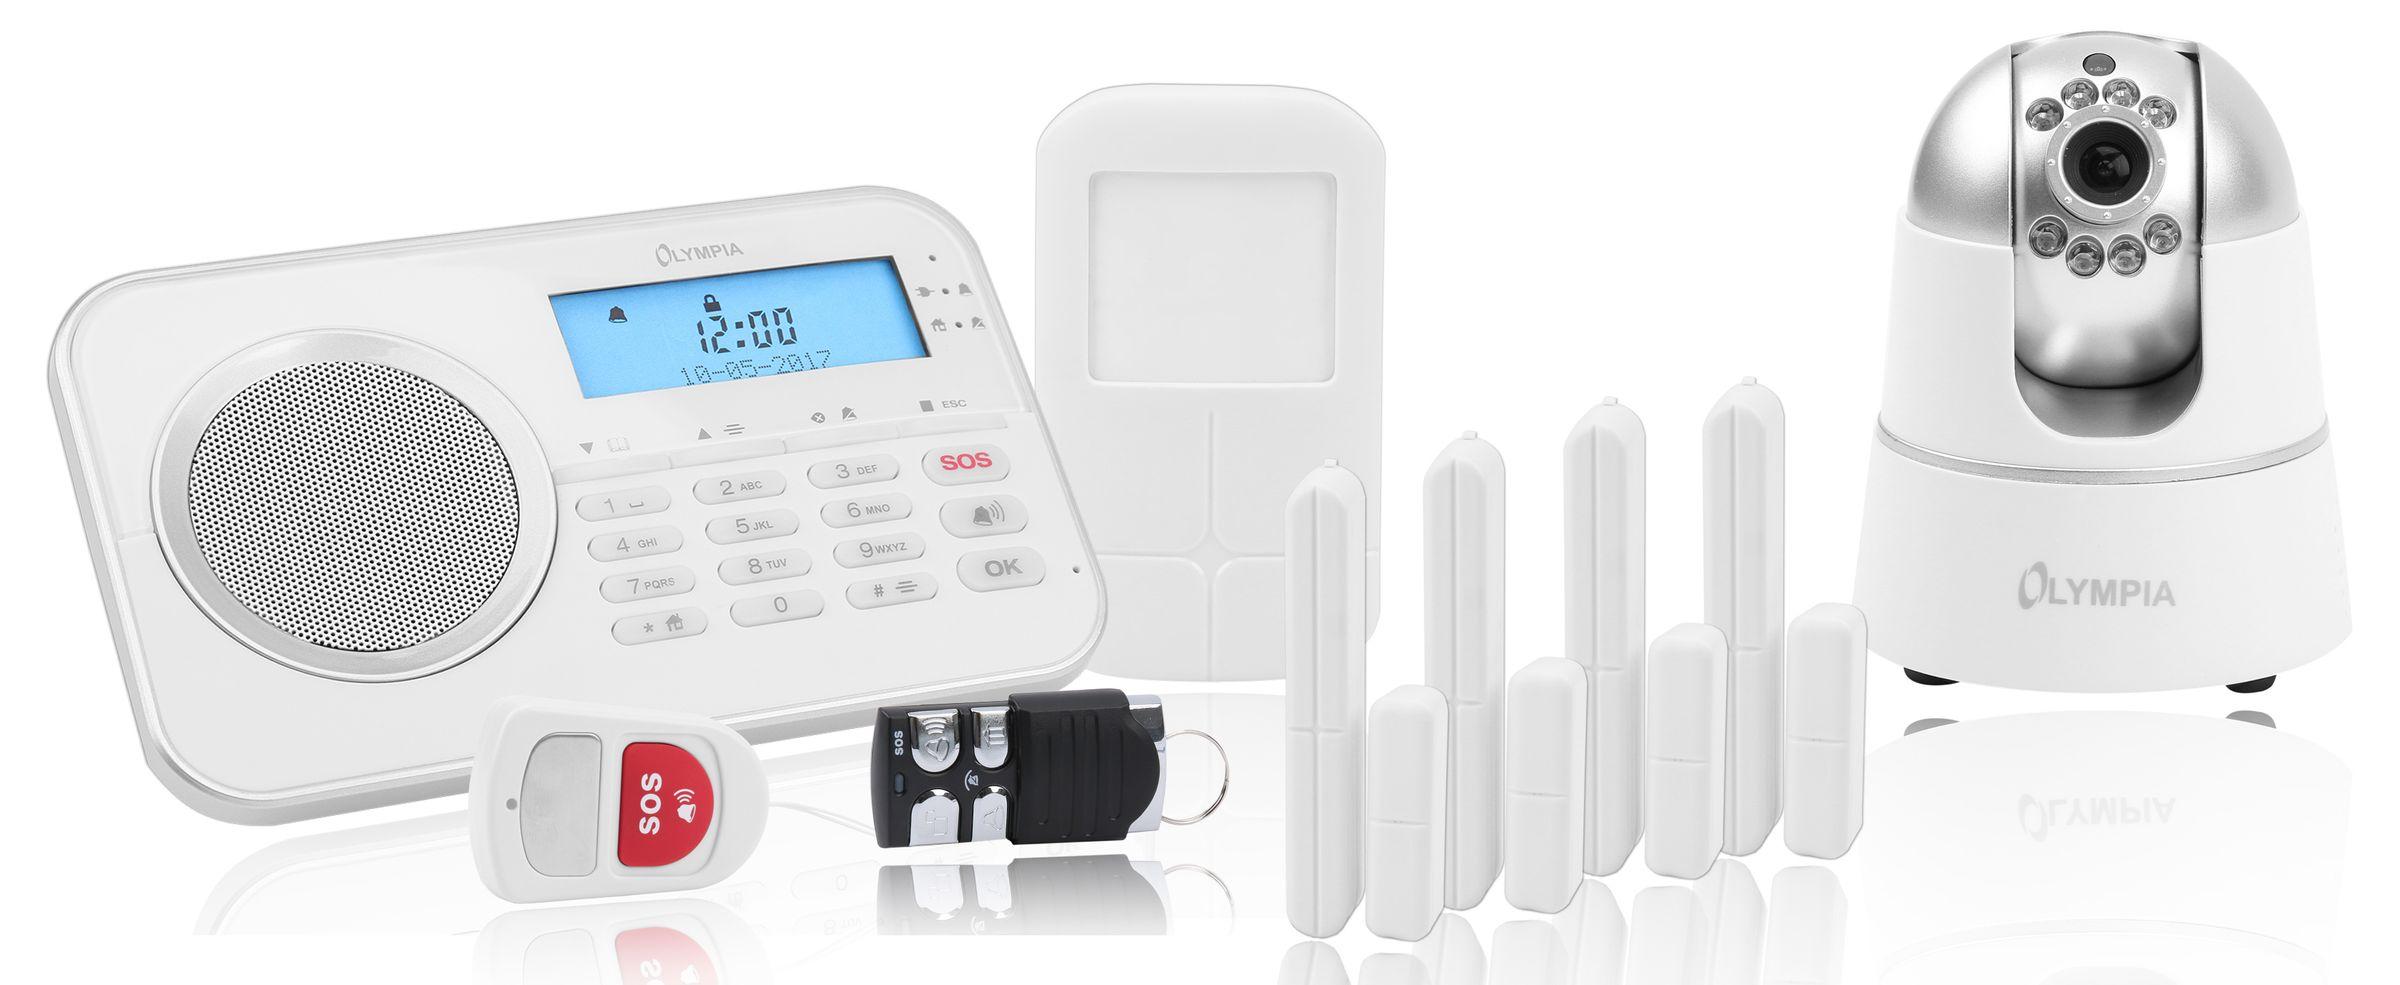 olympia protect 9881 gsm haus alarmanlage funk alarmsystem. Black Bedroom Furniture Sets. Home Design Ideas